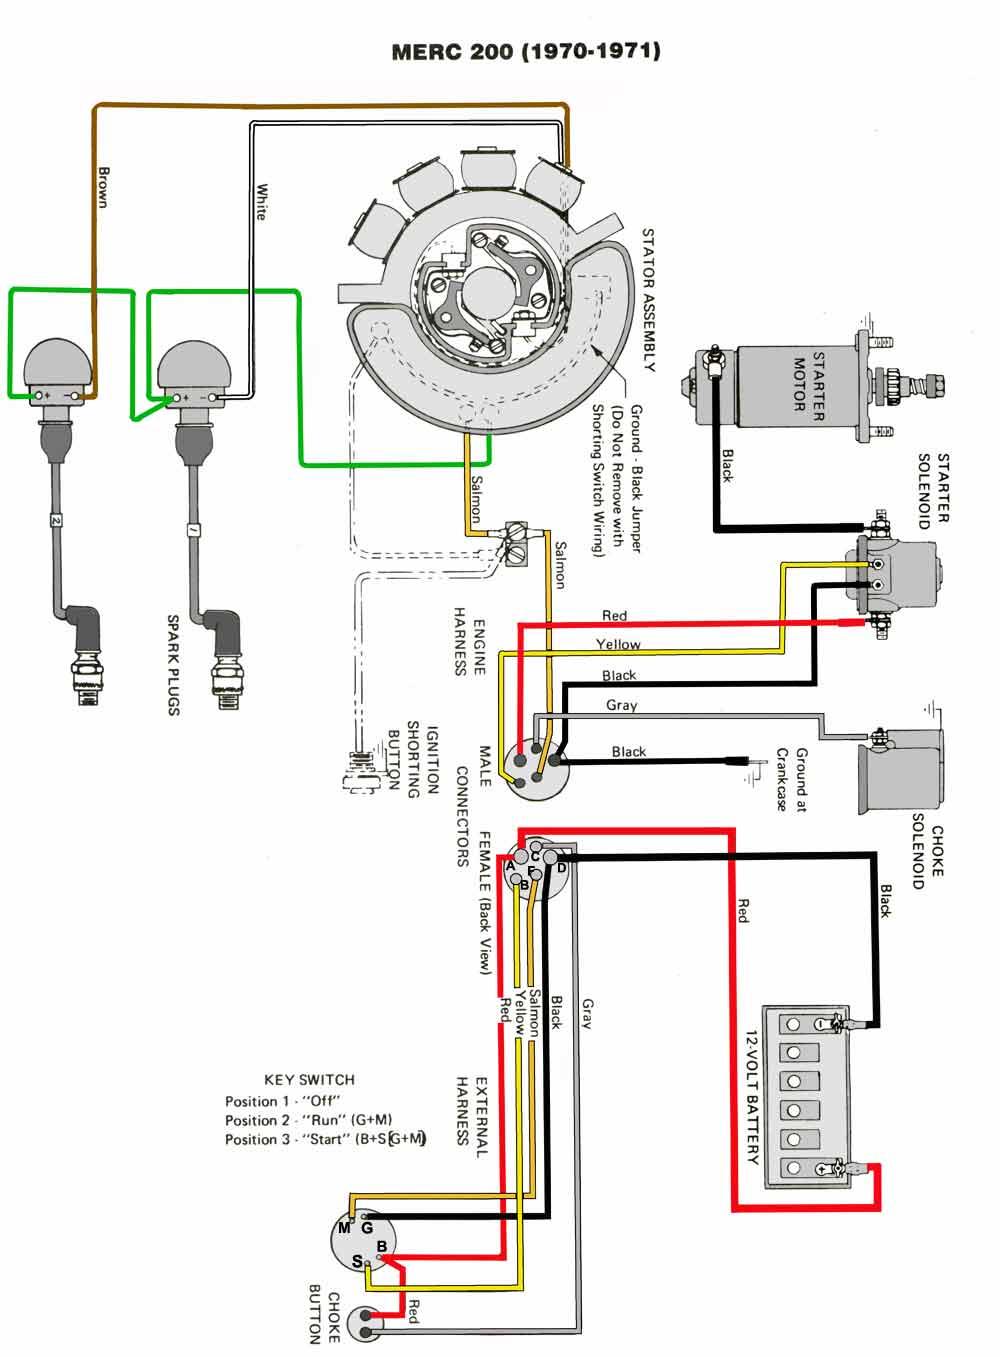 1993 40 hp yamaha outboard wiring diagram [ 1000 x 1357 Pixel ]